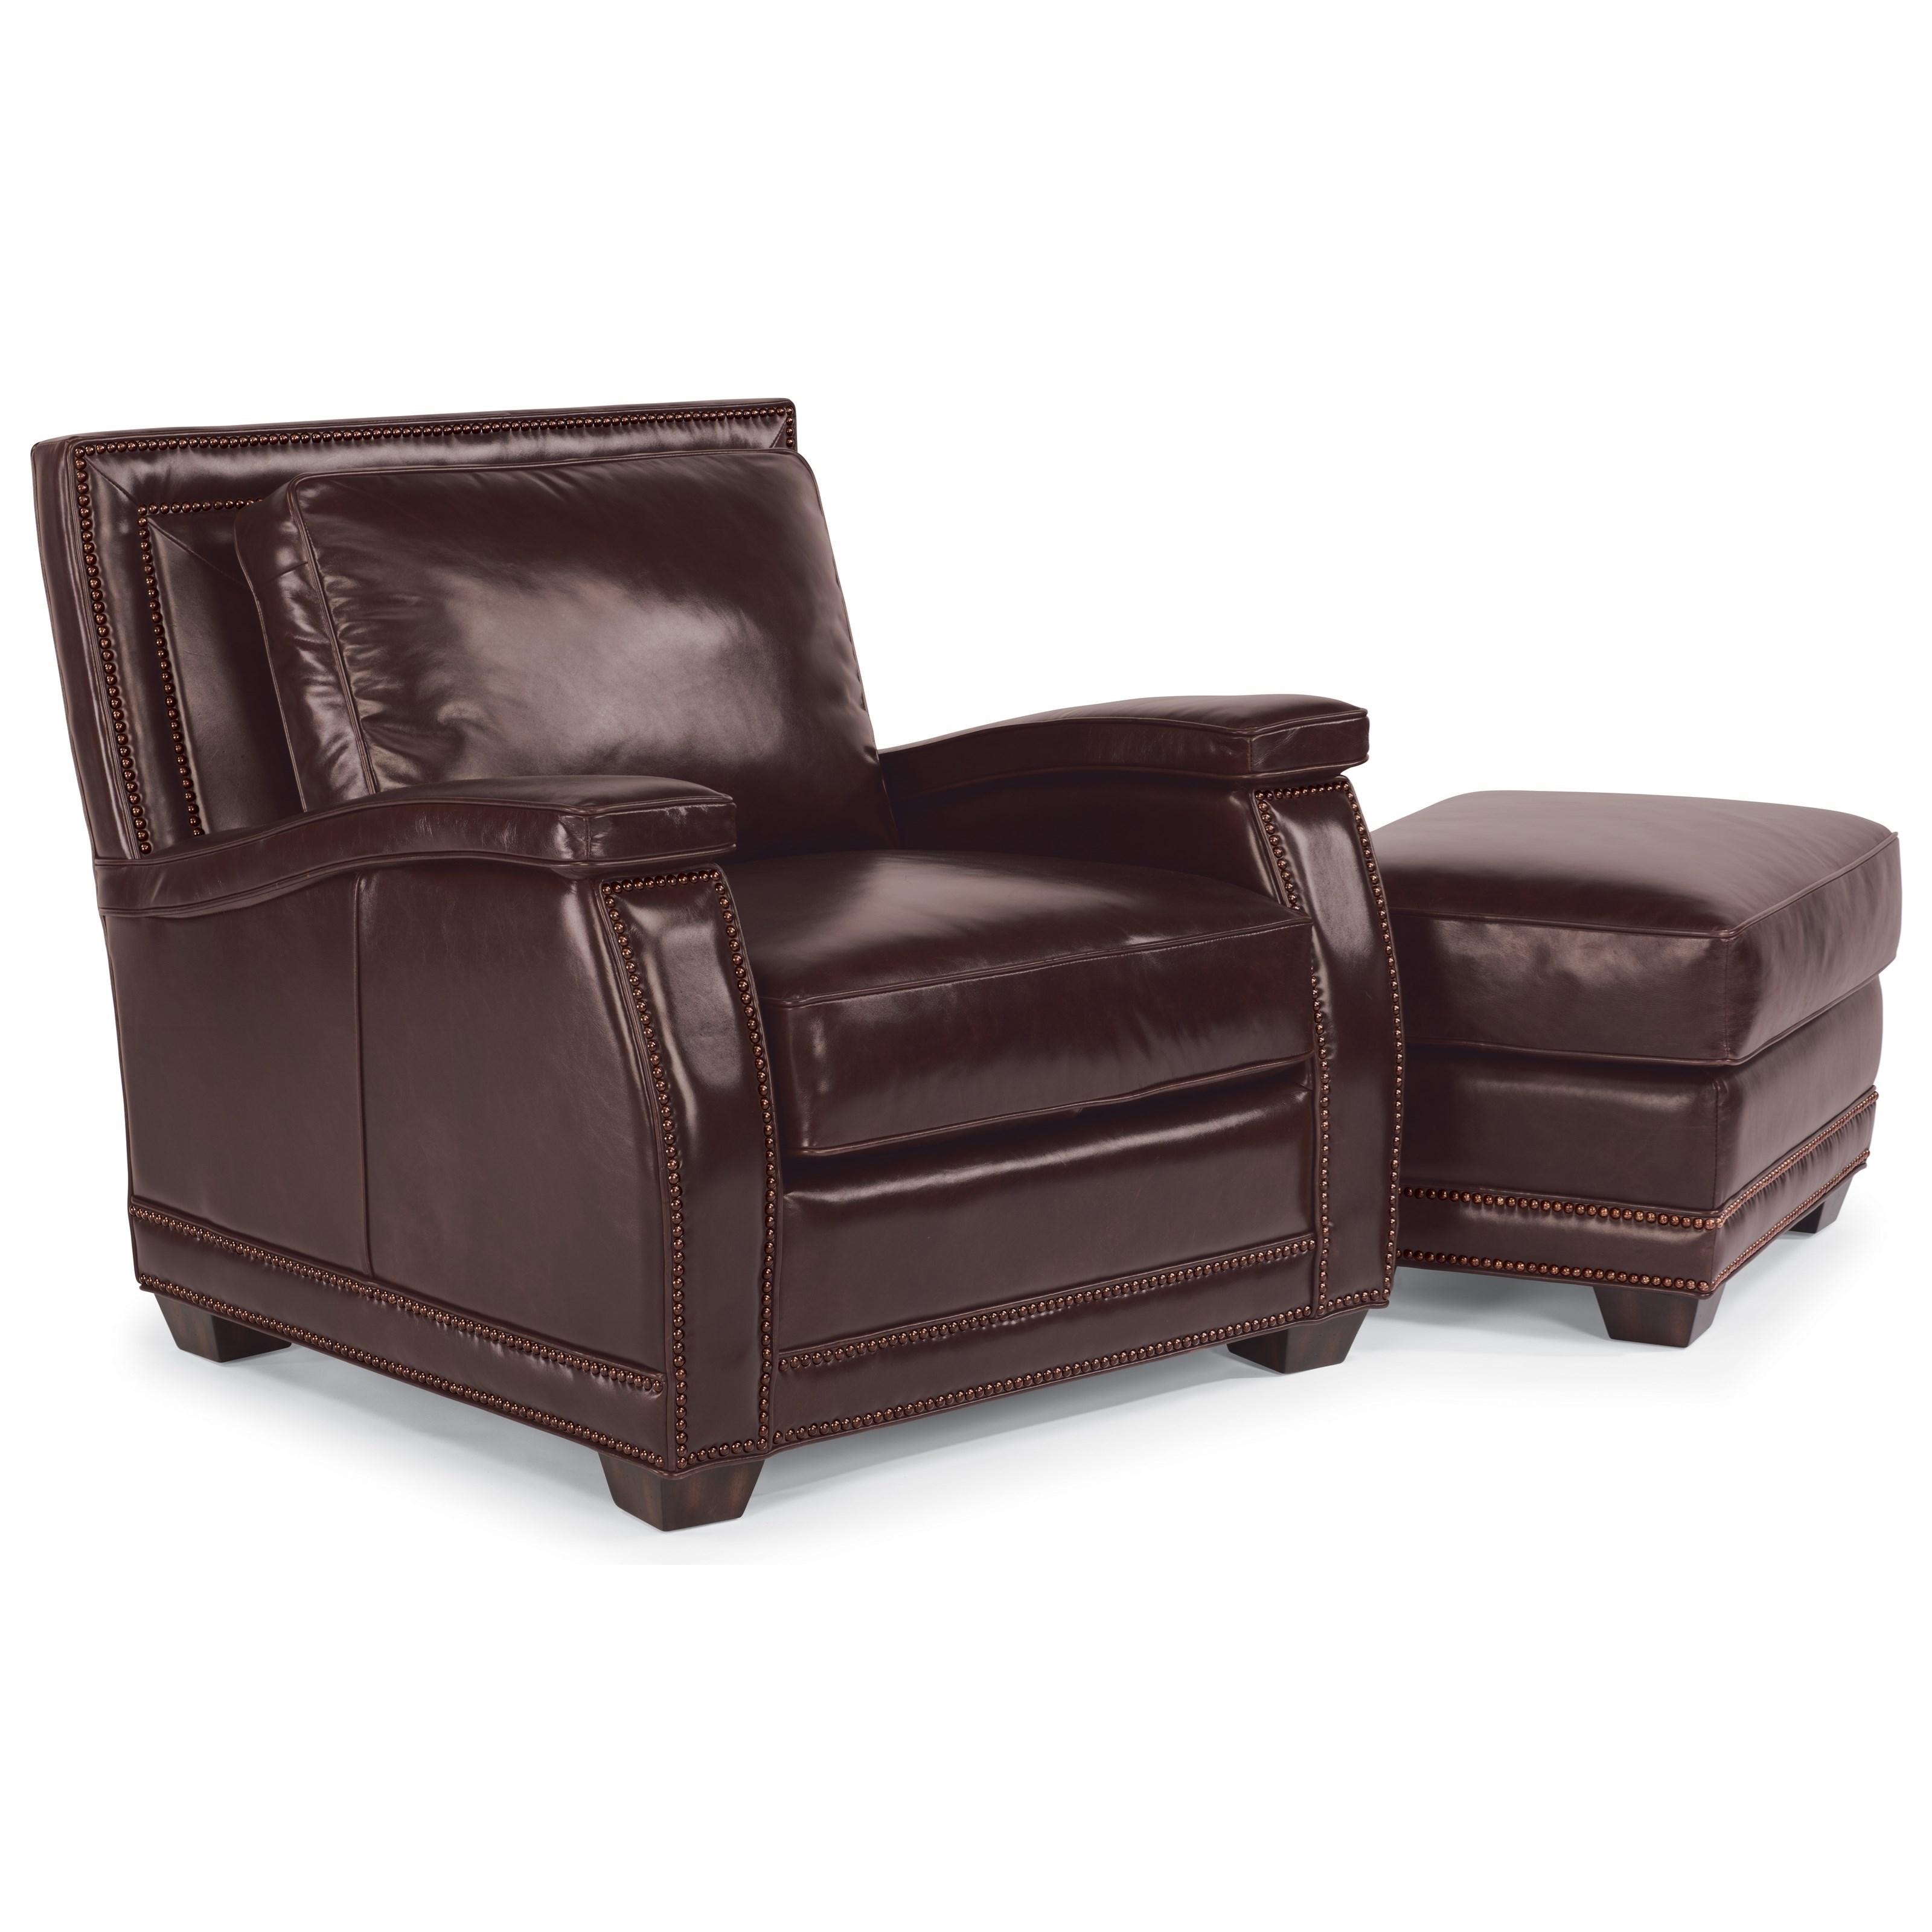 Flexsteel Rocking Chair Inspirations Home amp Interior Design